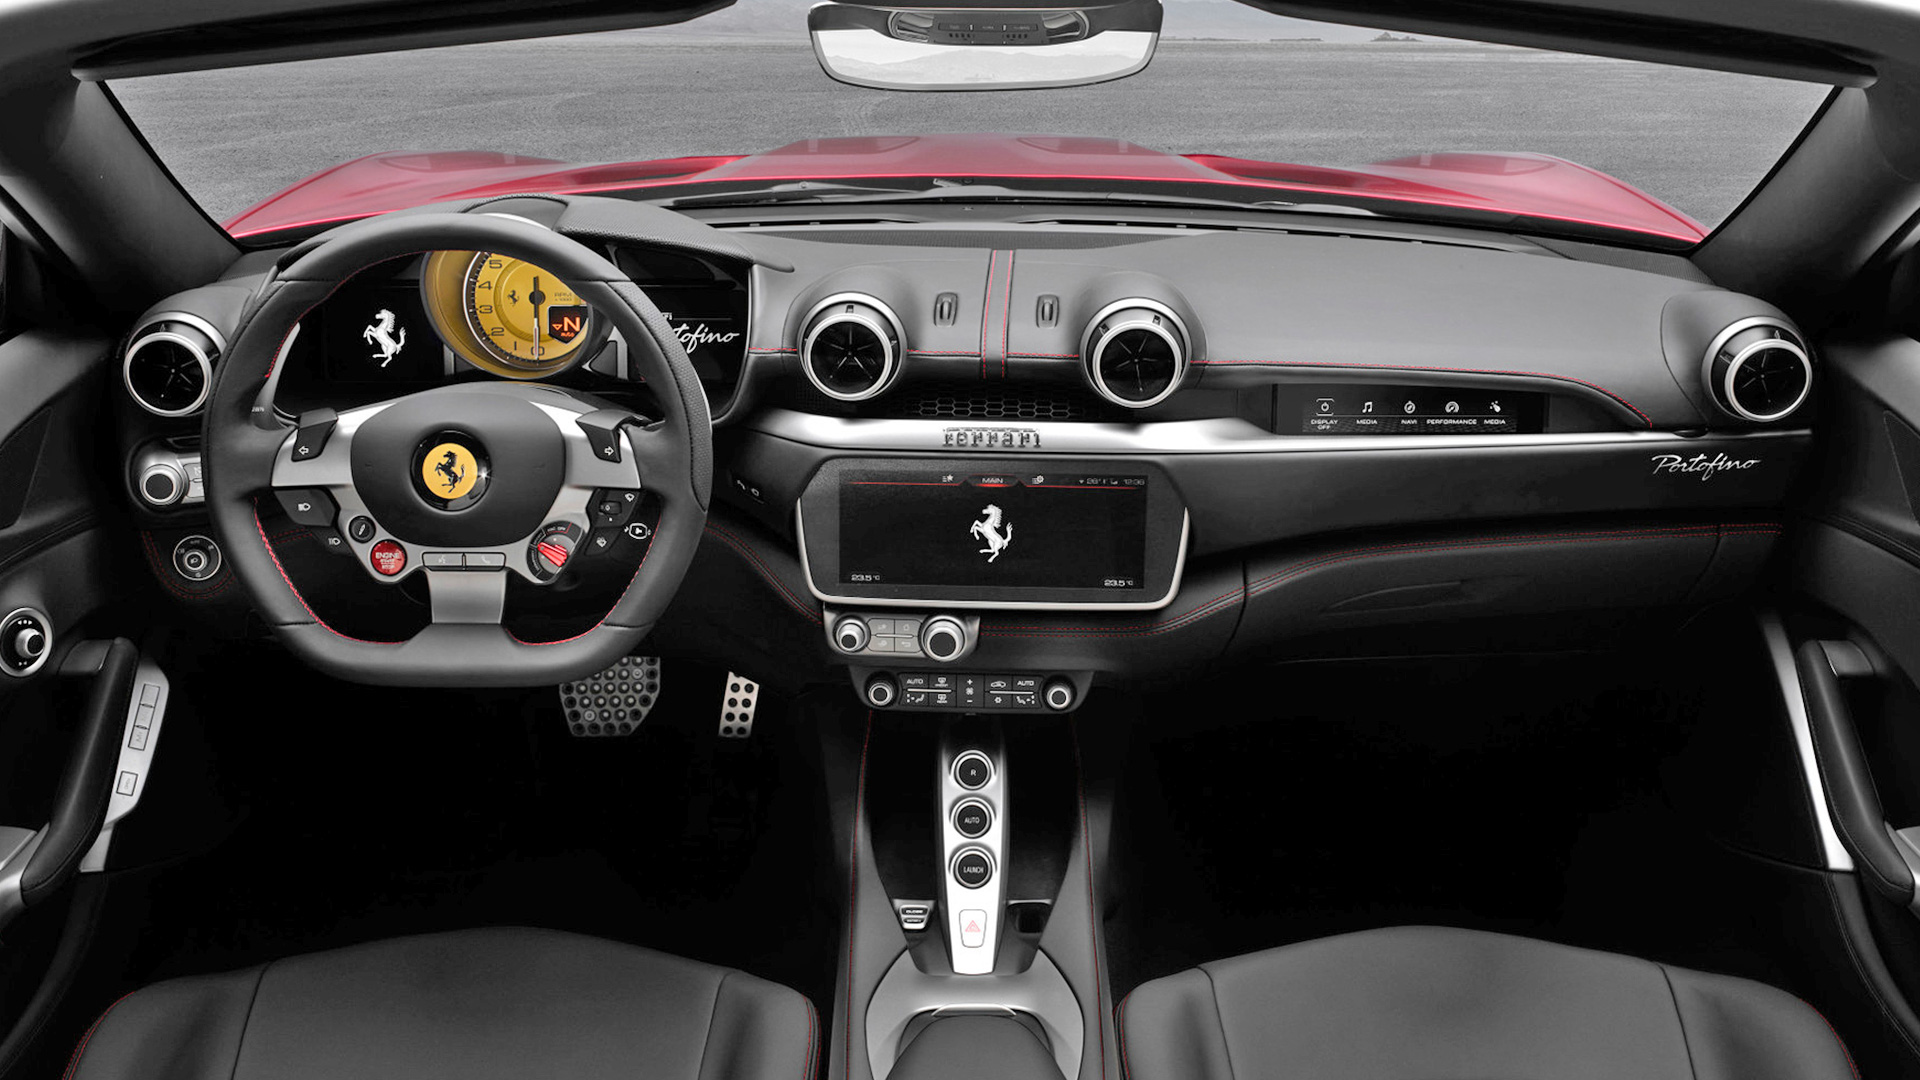 Ferrari Portofino 2018 STD Exterior Car Photos - Overdrive